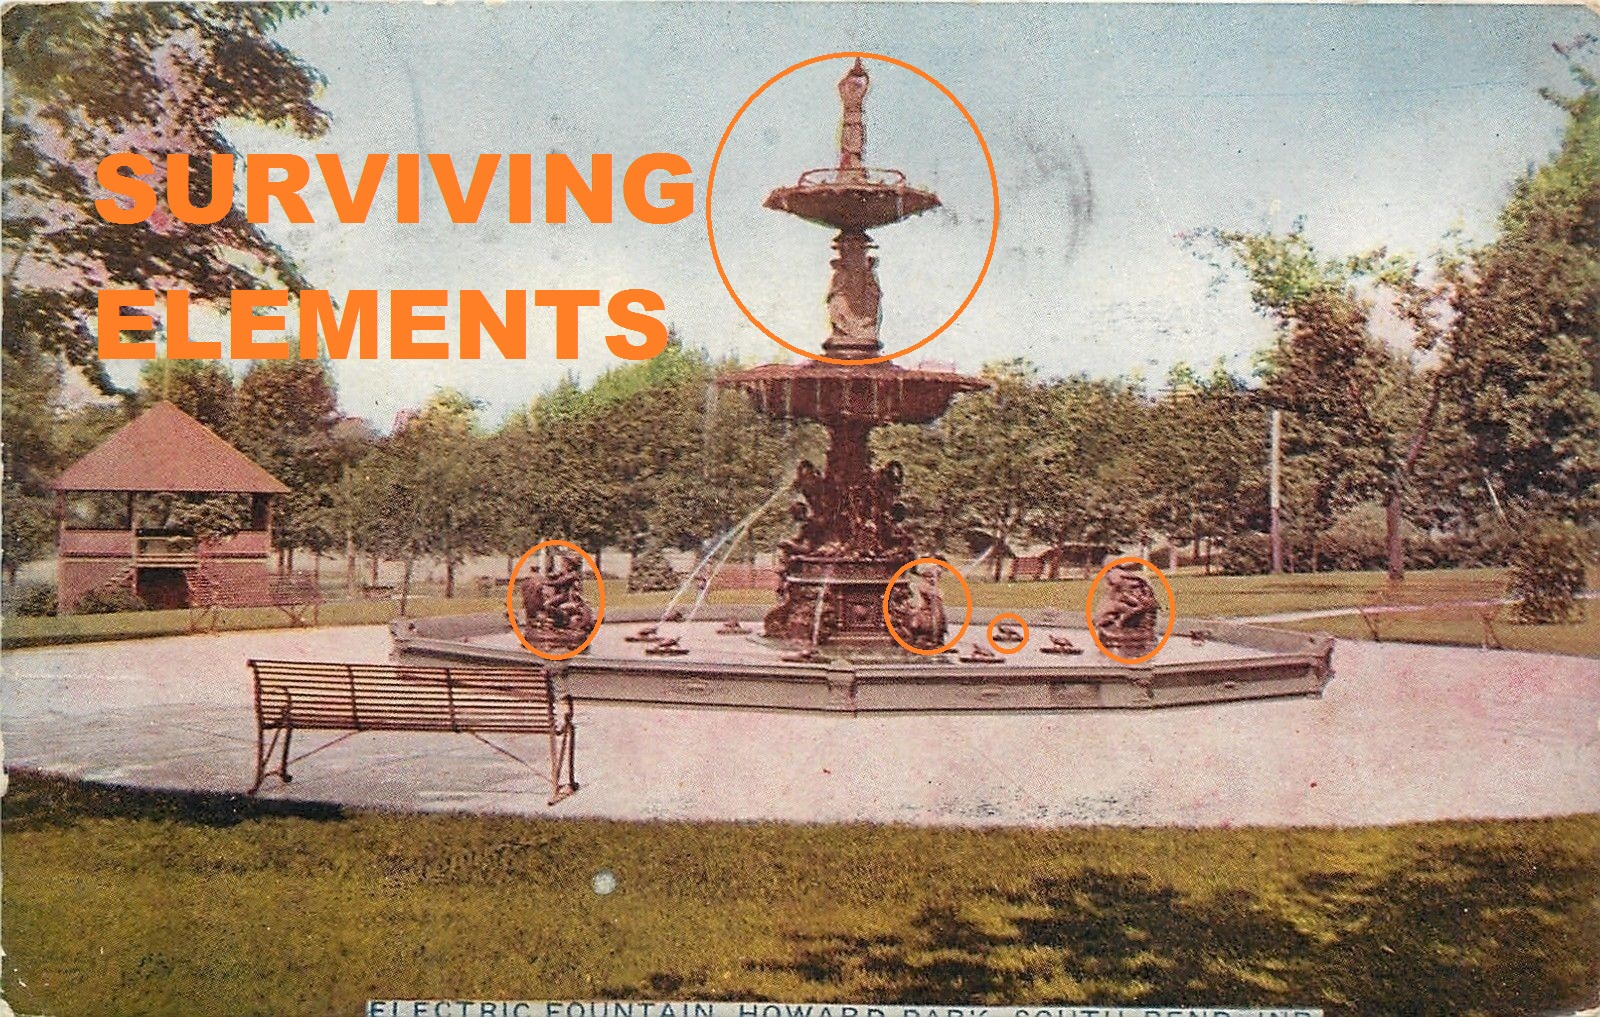 Vintage postcard of Studebaker Electric Fountain